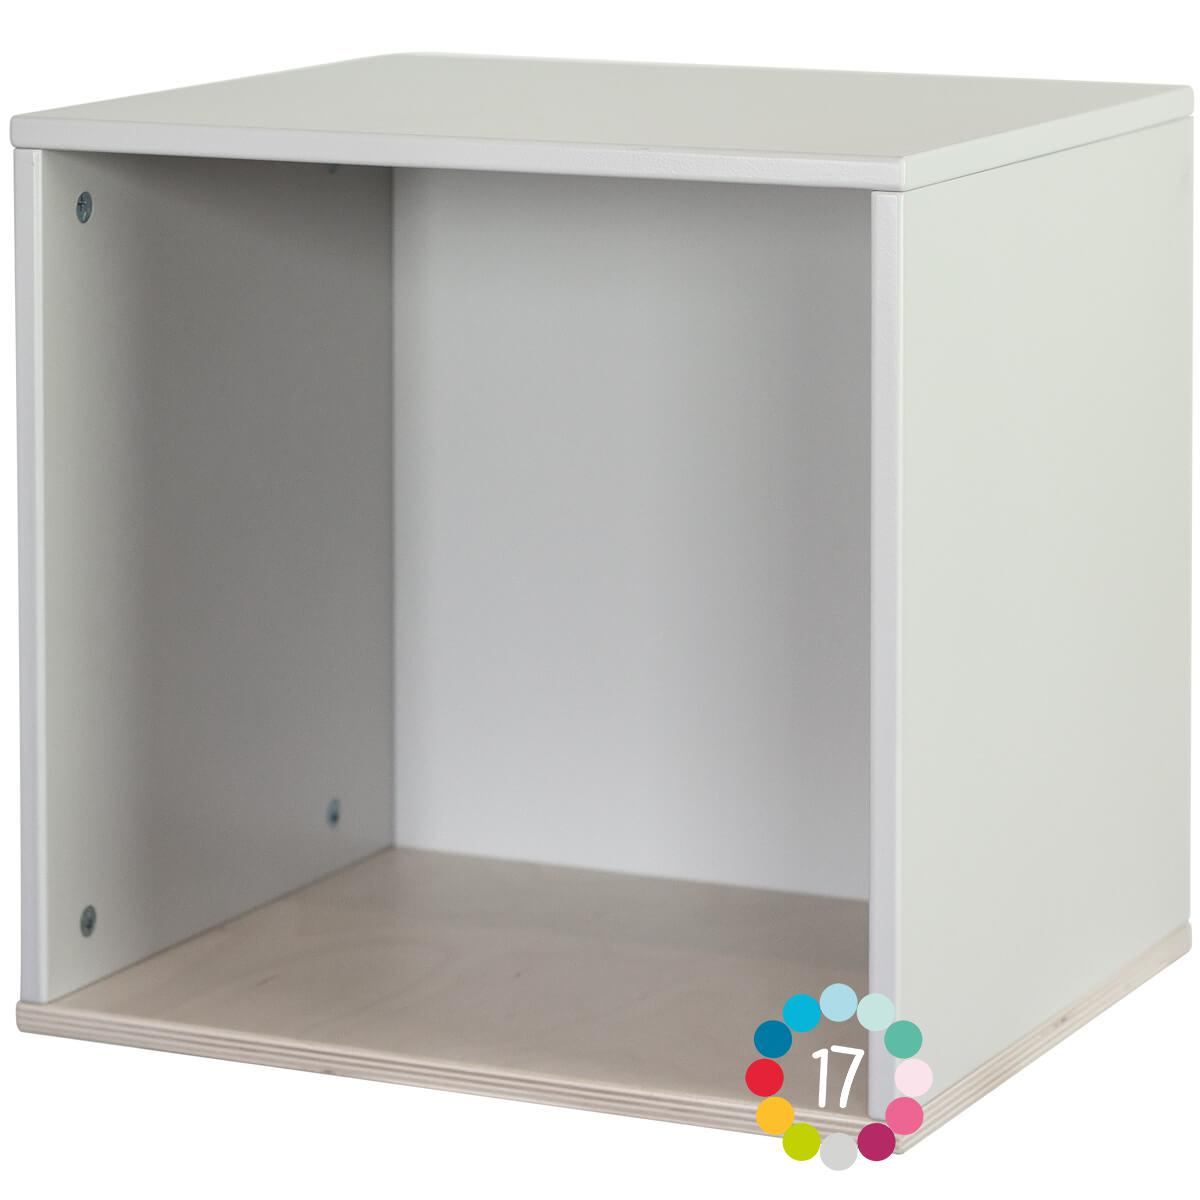 Cube mural COLORFLEX pearl grey